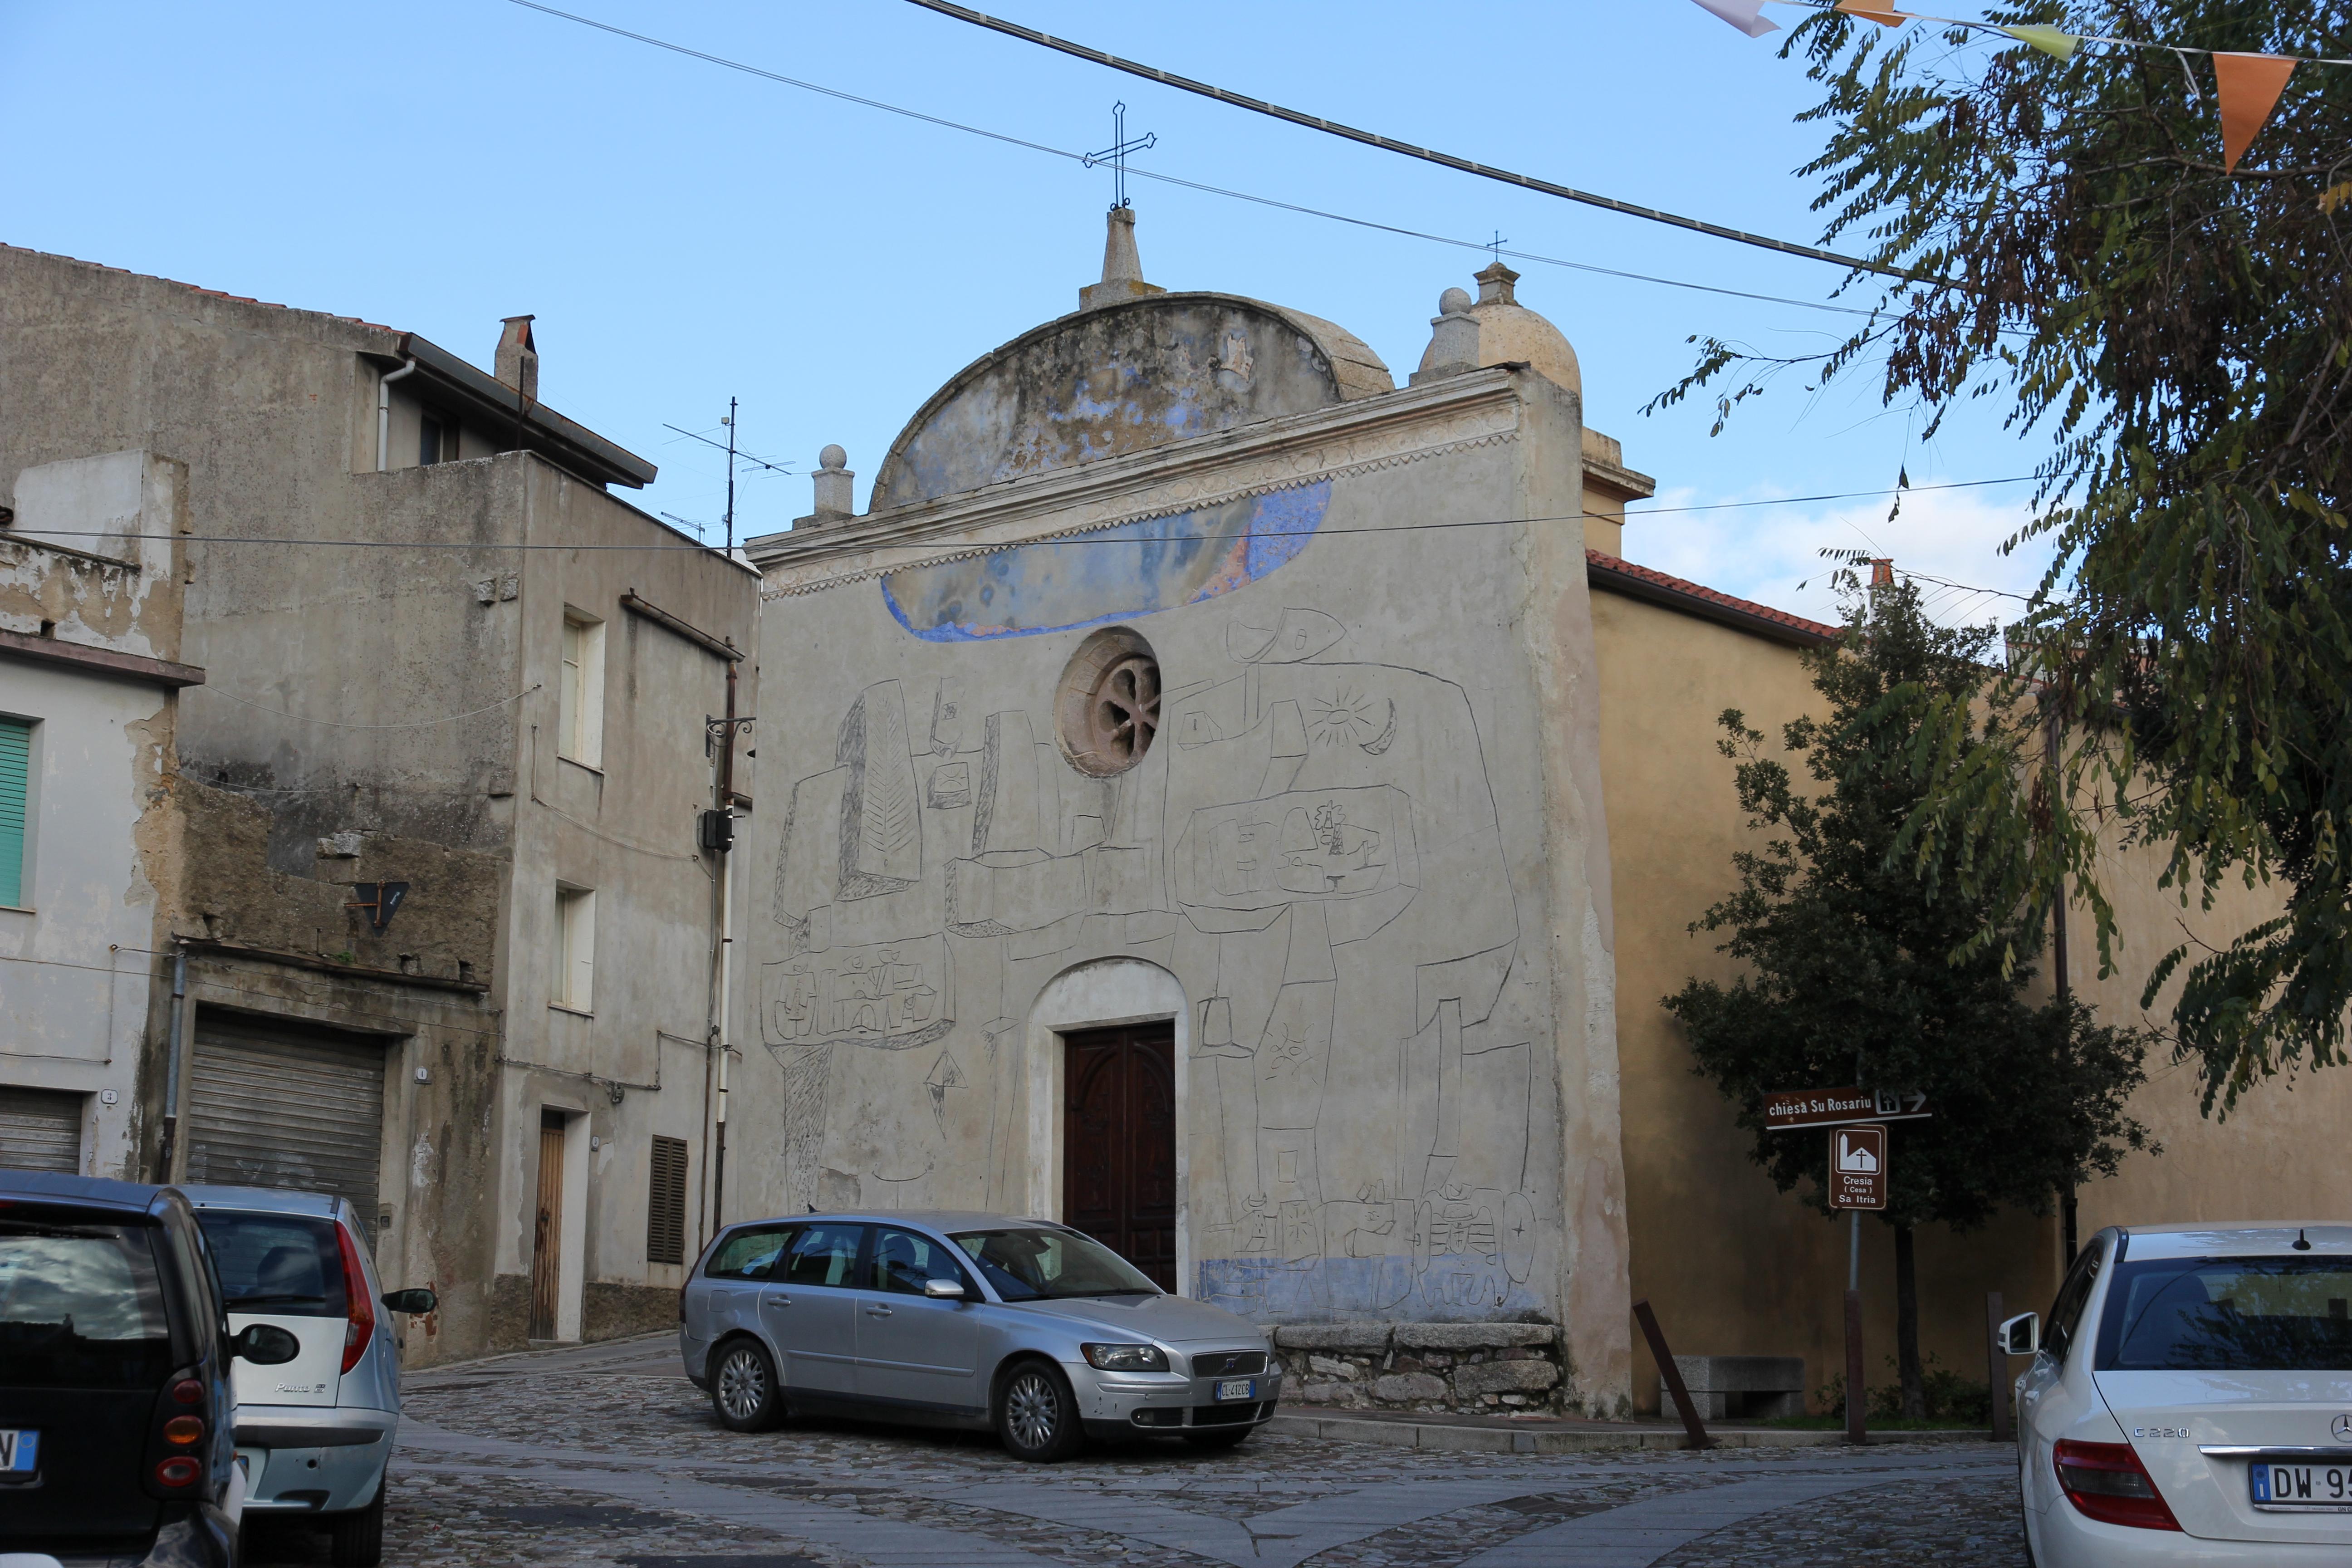 https://upload.wikimedia.org/wikipedia/commons/f/f9/Orani%2C_chiesa_di_Nostra_Signora_d%27Itria_%2801%29.jpg